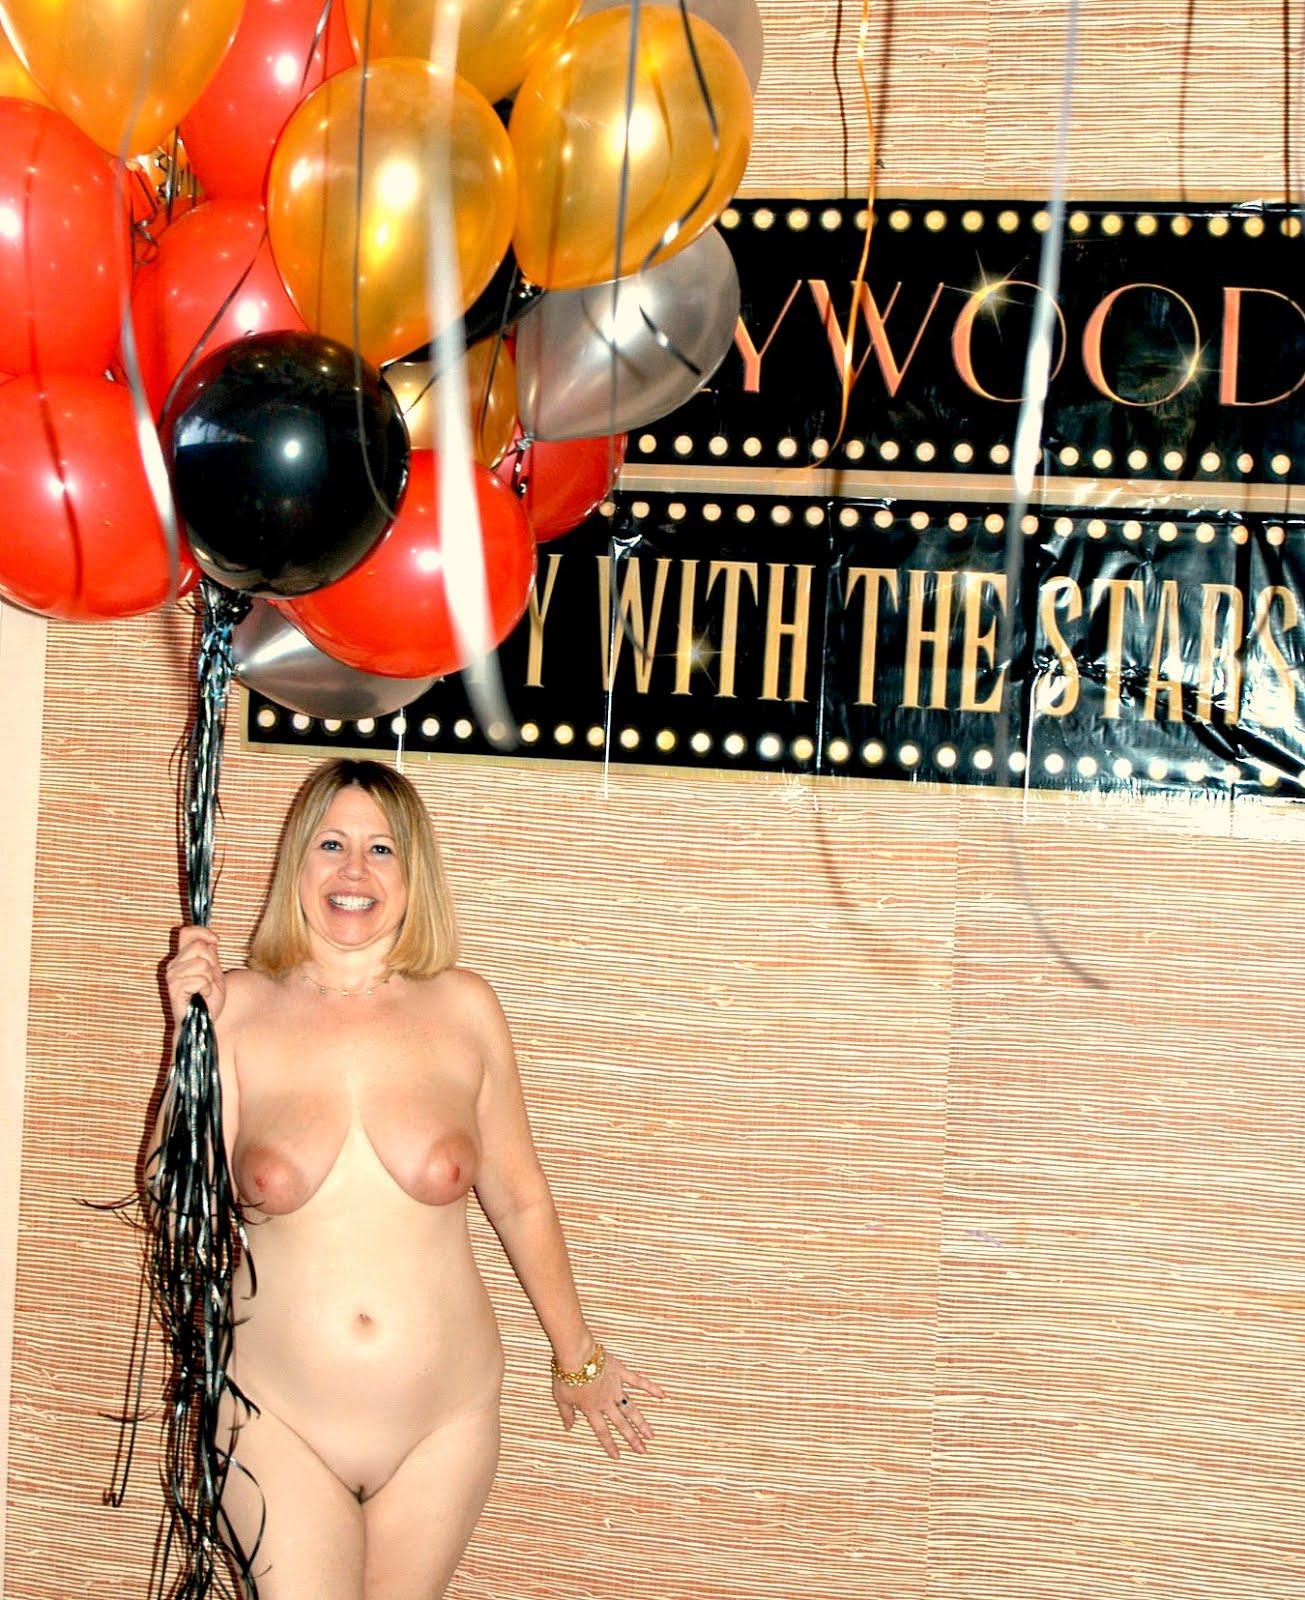 http://2.bp.blogspot.com/-3RHZG2zMzPo/UNULEEvylAI/AAAAAAAAHyc/3EnhSZ1w1vU/s1600/Topless%2Bnew%2Byears%2Beve%2Bparty%2B9.jpg